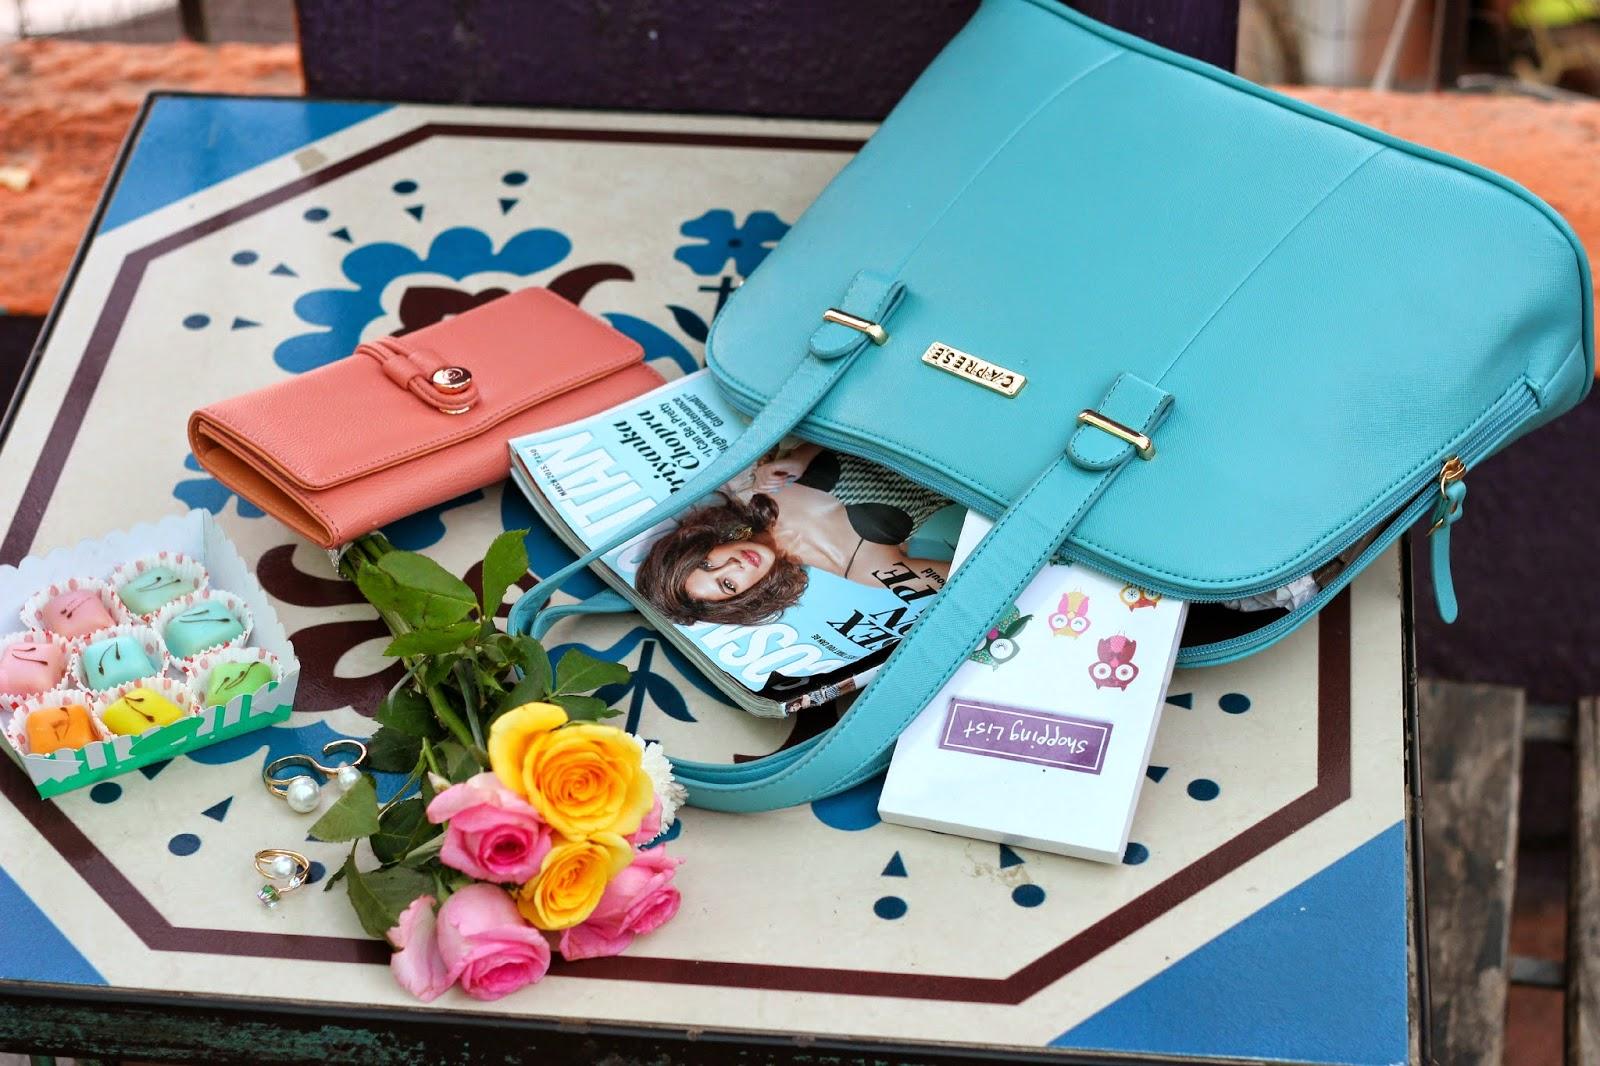 Caprese Zeta Satchel Medium in Light Blue, Pink Wallet,Roses